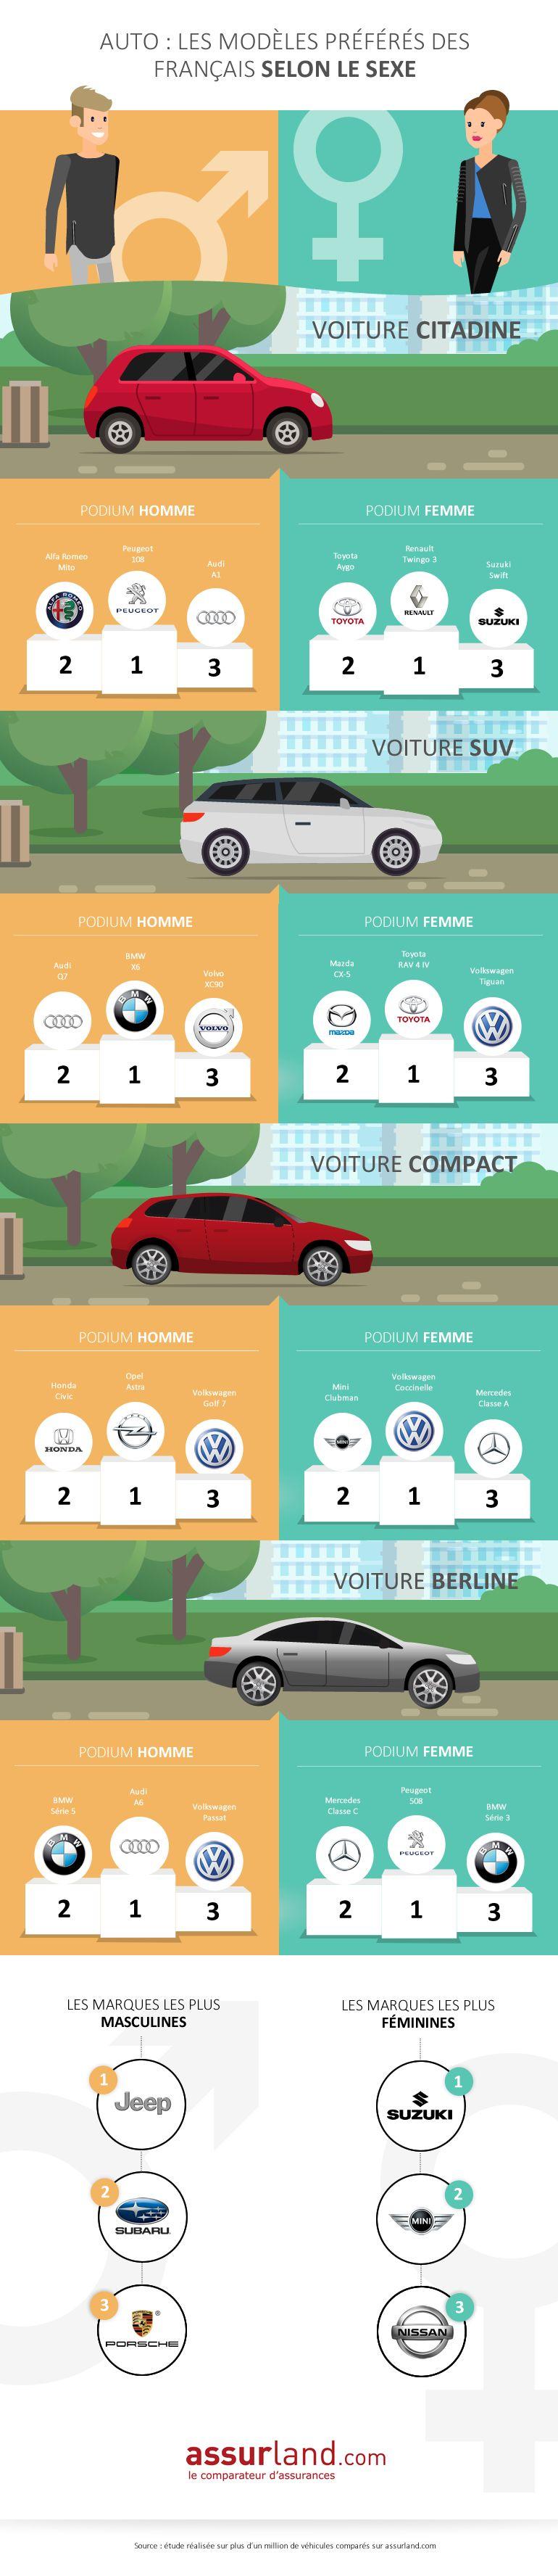 infographie-marque-voiture-homme-vs-femme